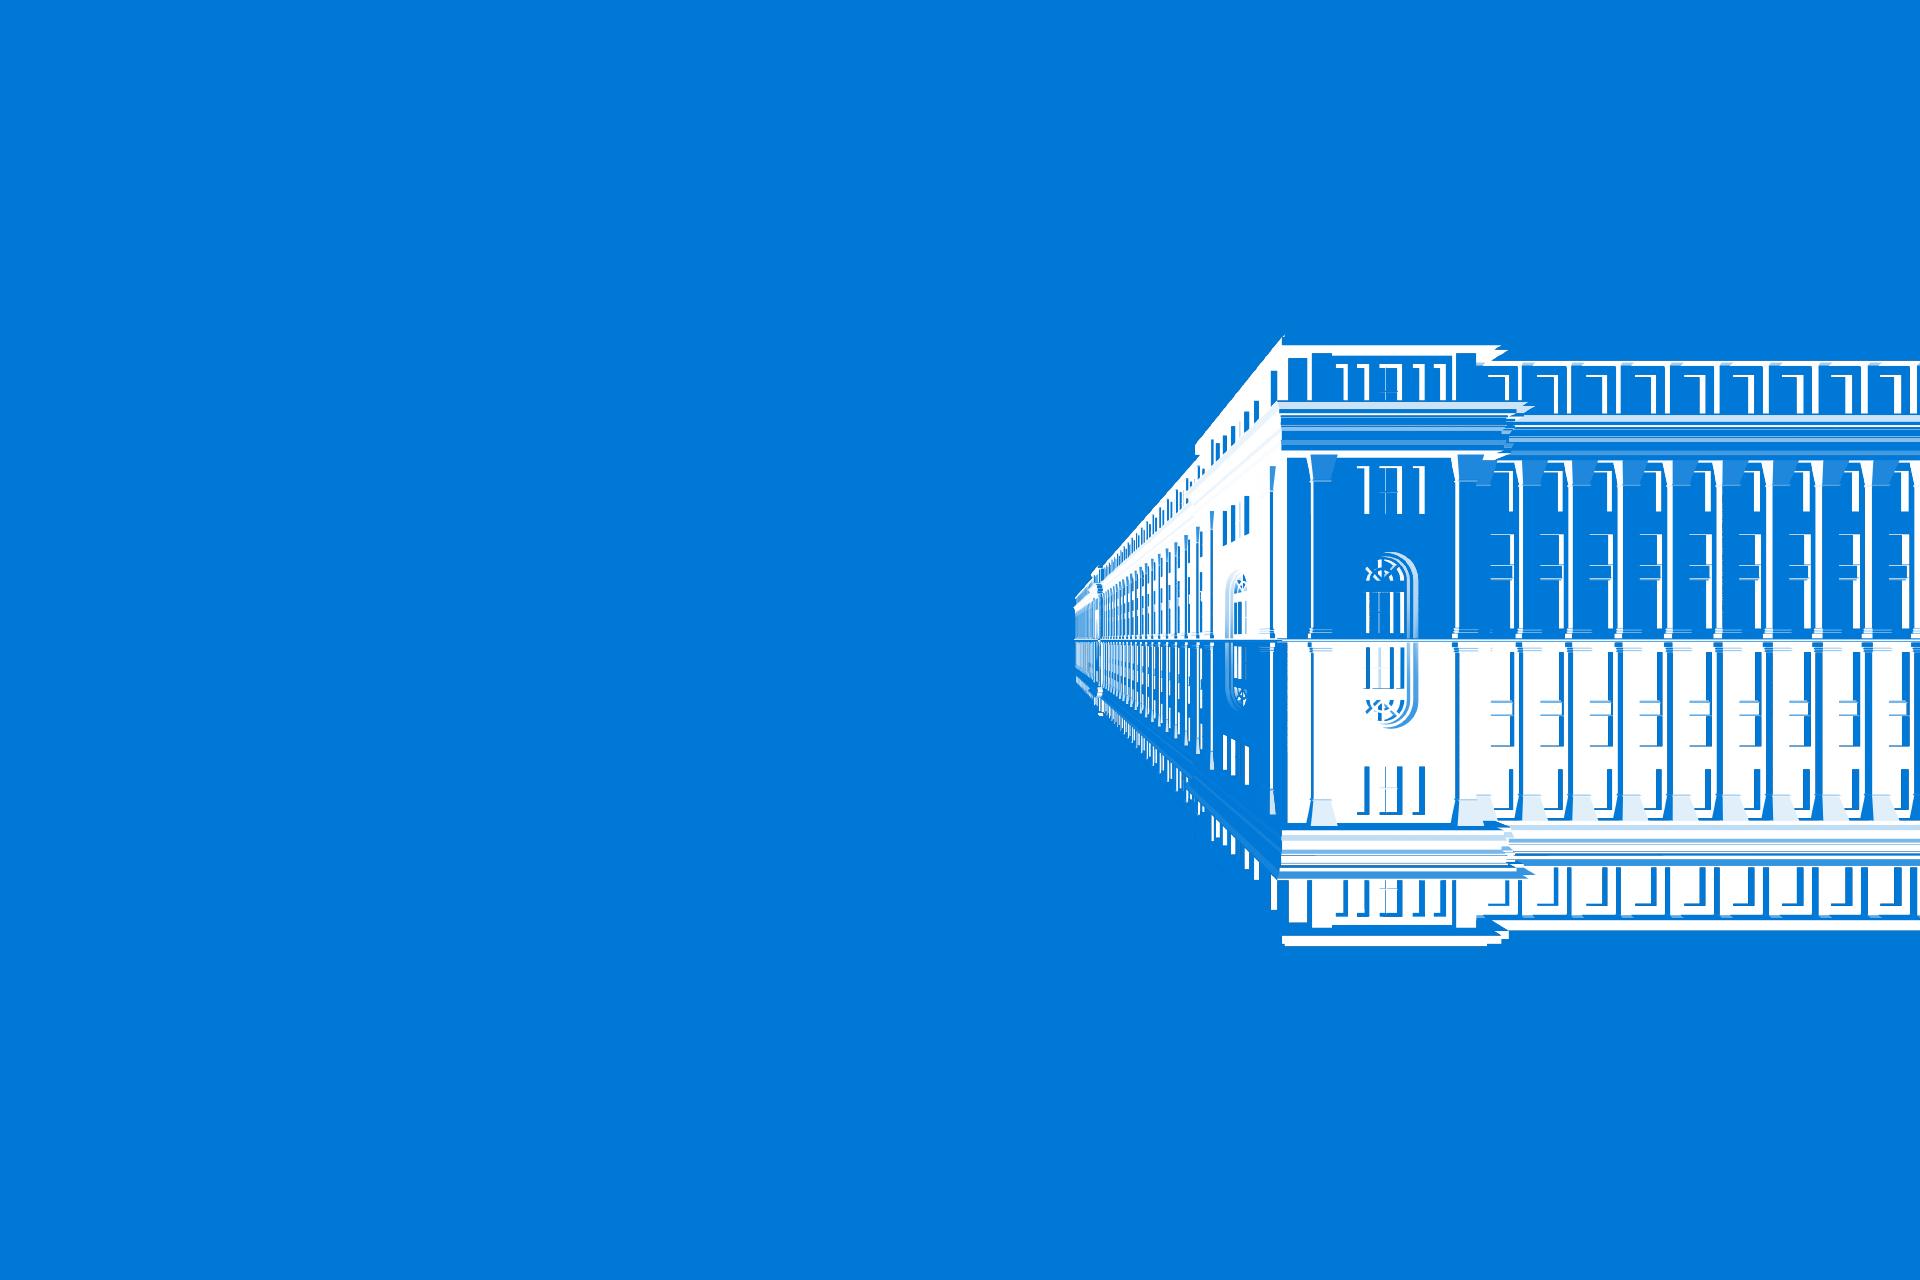 windows-10-devices-event2x